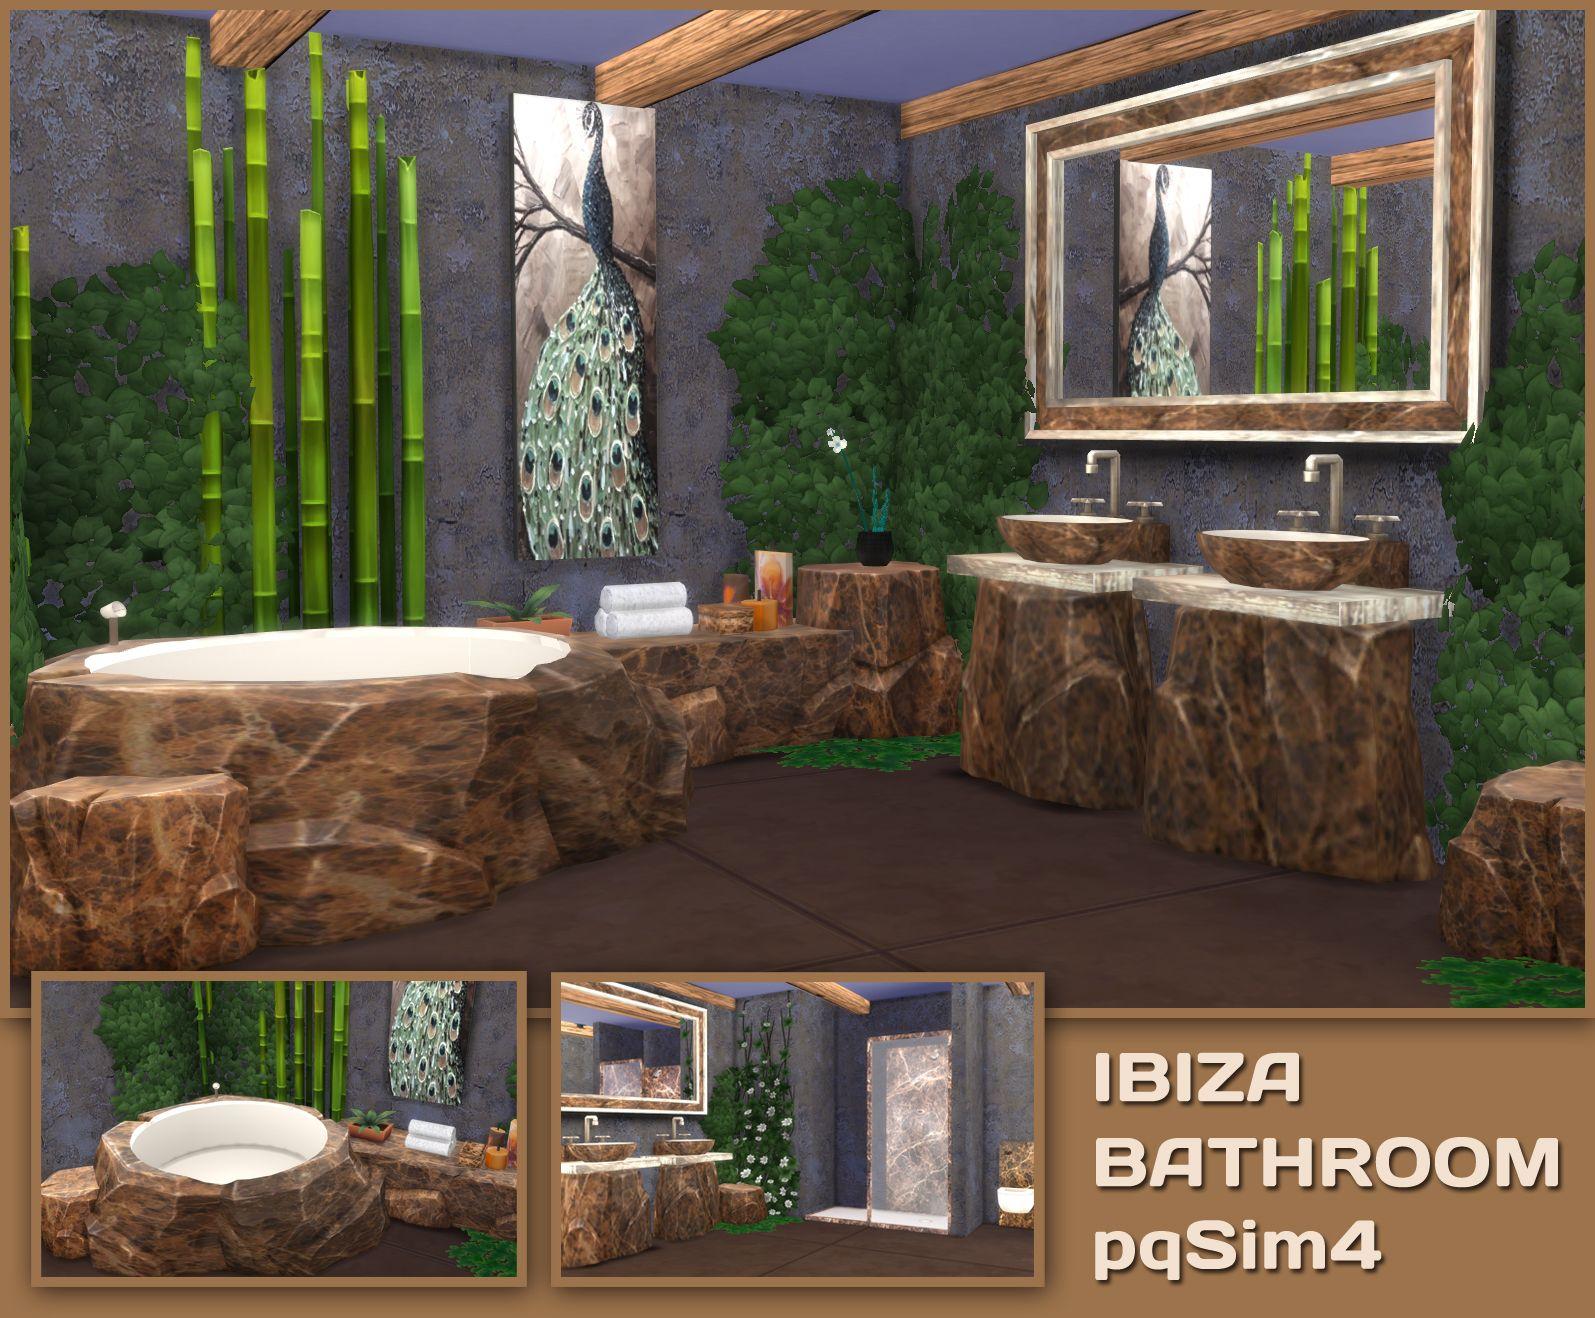 sims 4 bathroom ibiza the sims 4 cc buildmode pinterest